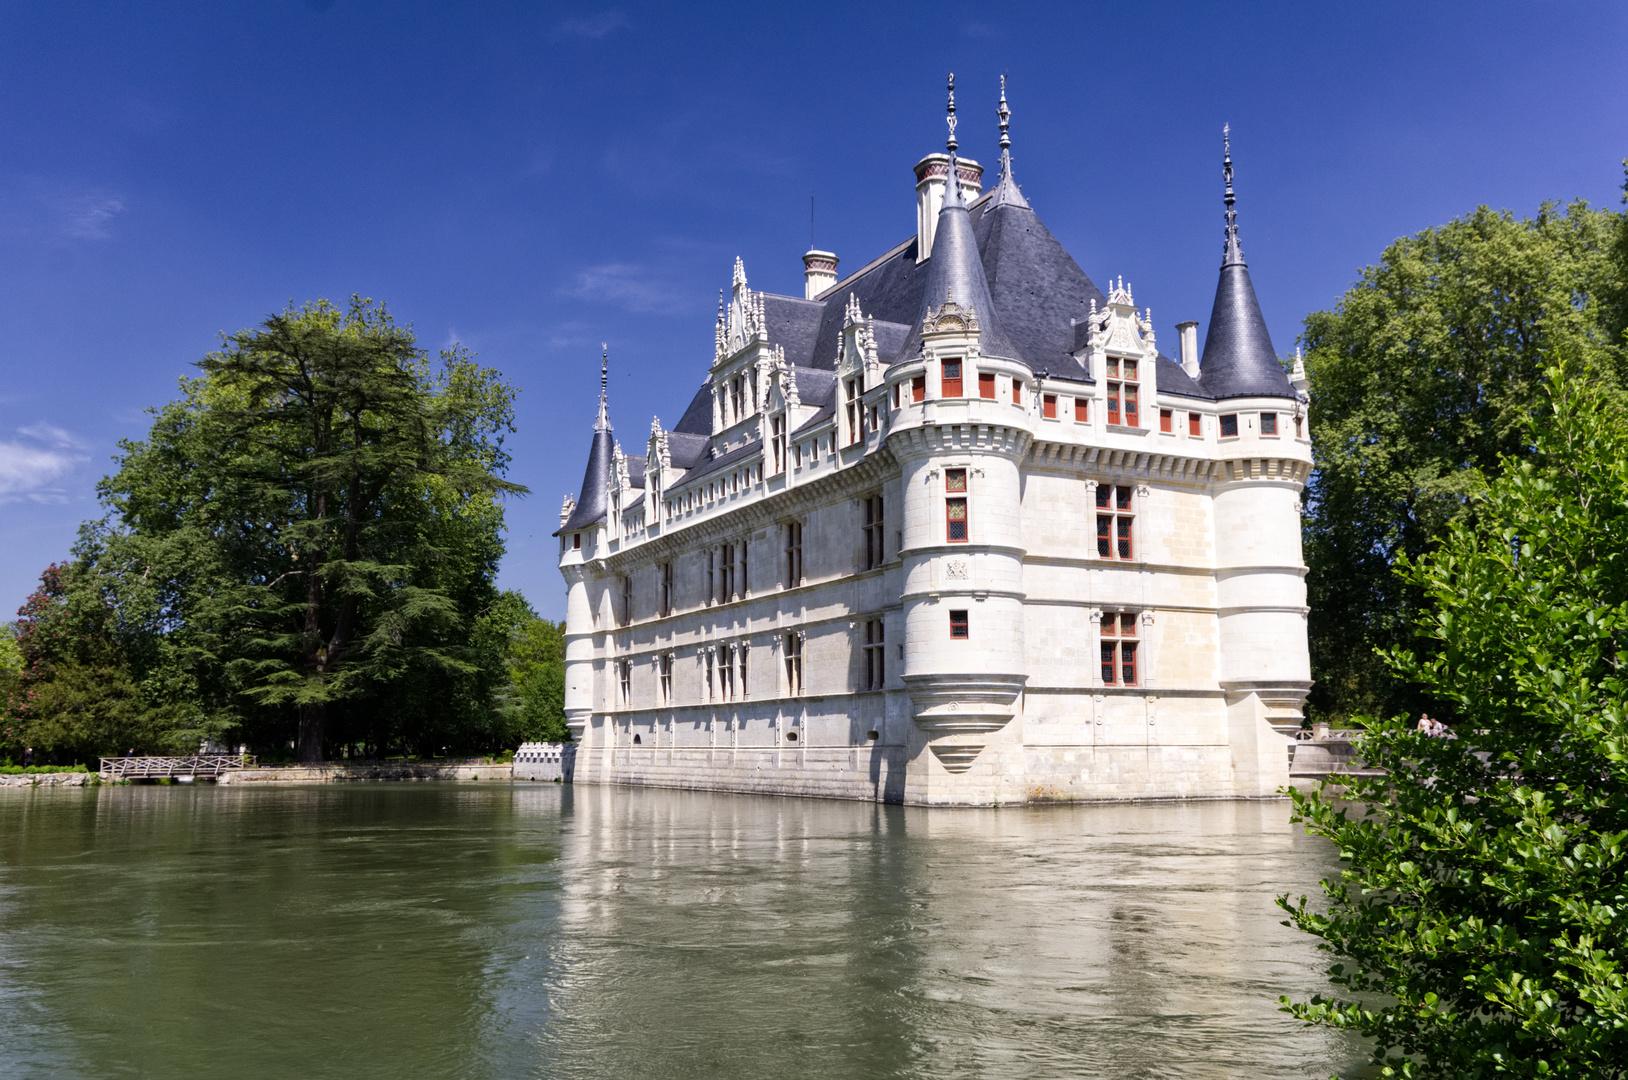 Azay-le-Rideau Foto & Bild   architektur, europe, france Bilder auf ...